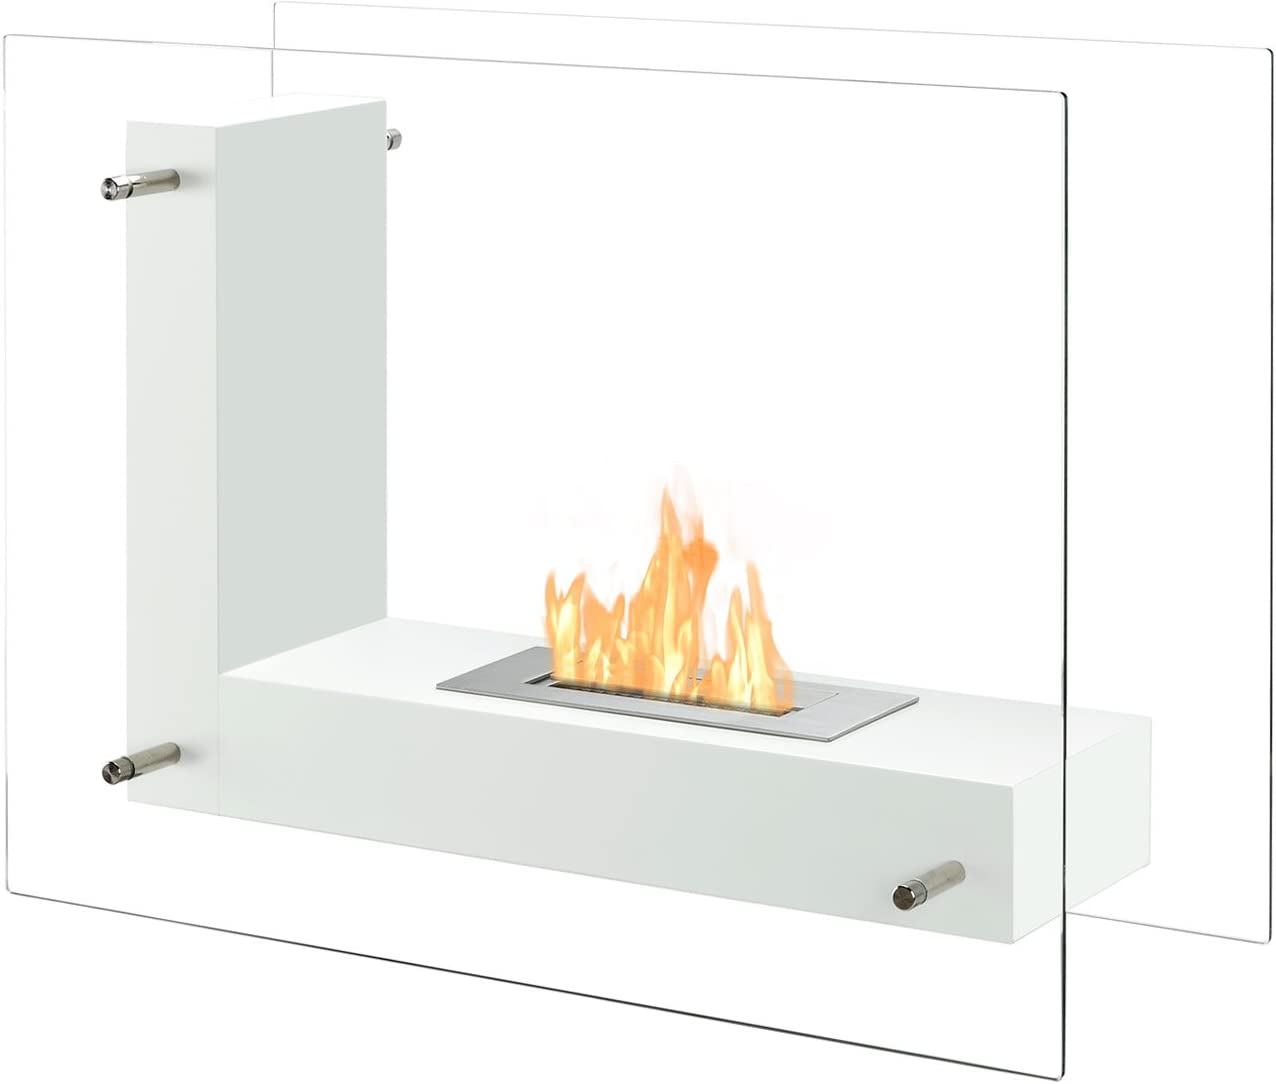 Freestanding Ventless Bio Ethanol Fireplace Vitrum Wholesale - supreme White L I